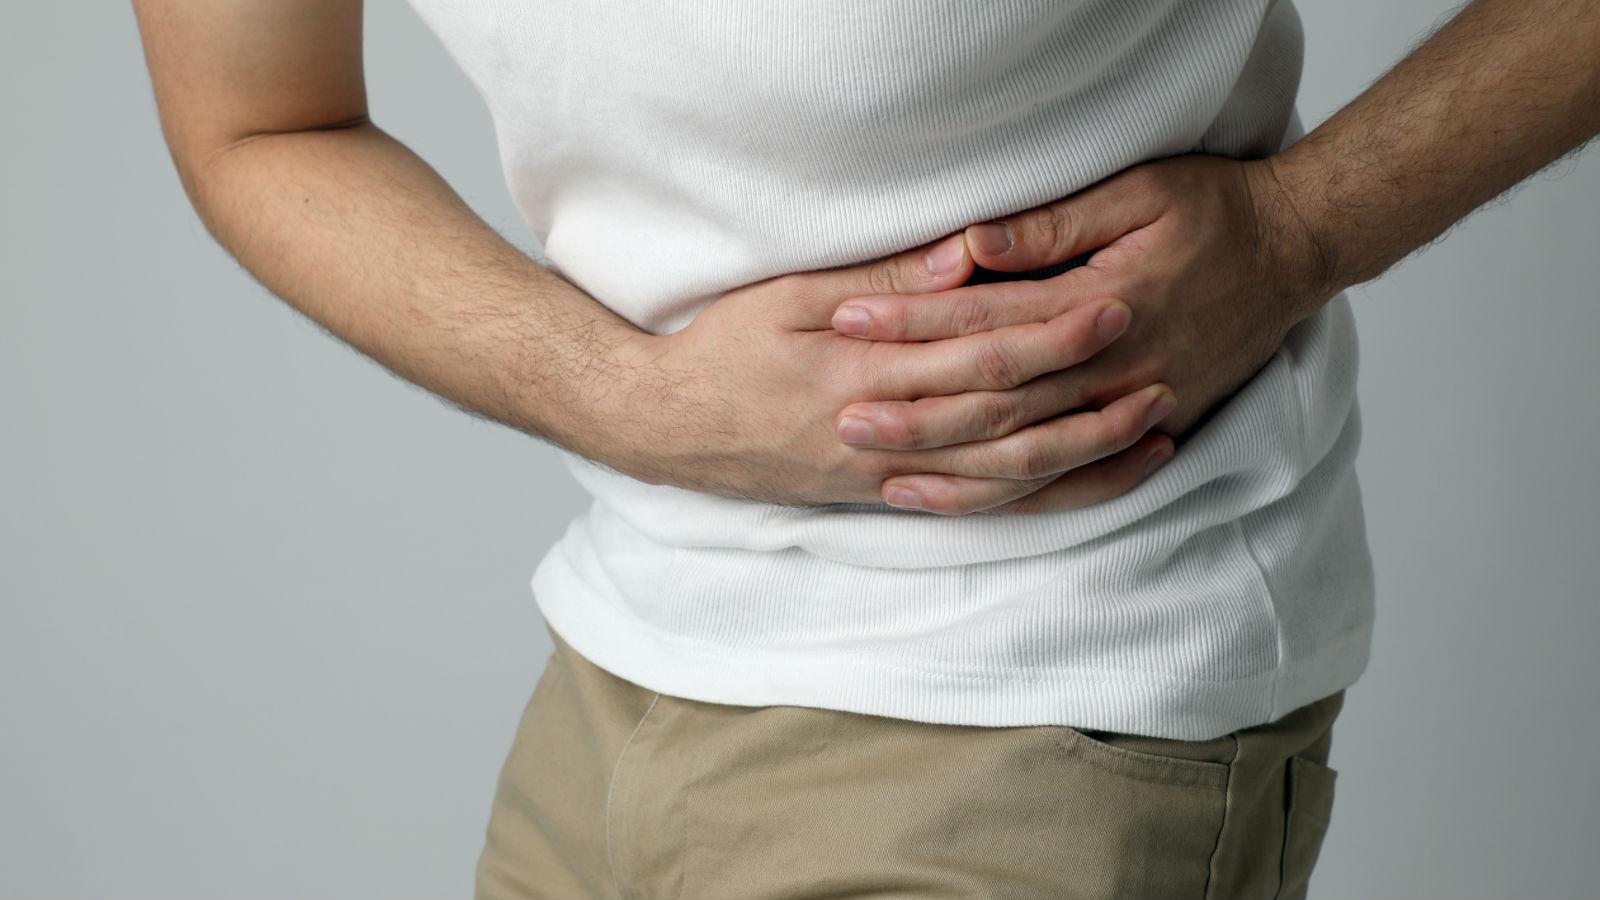 próstata inflamada pierde peso para siempre